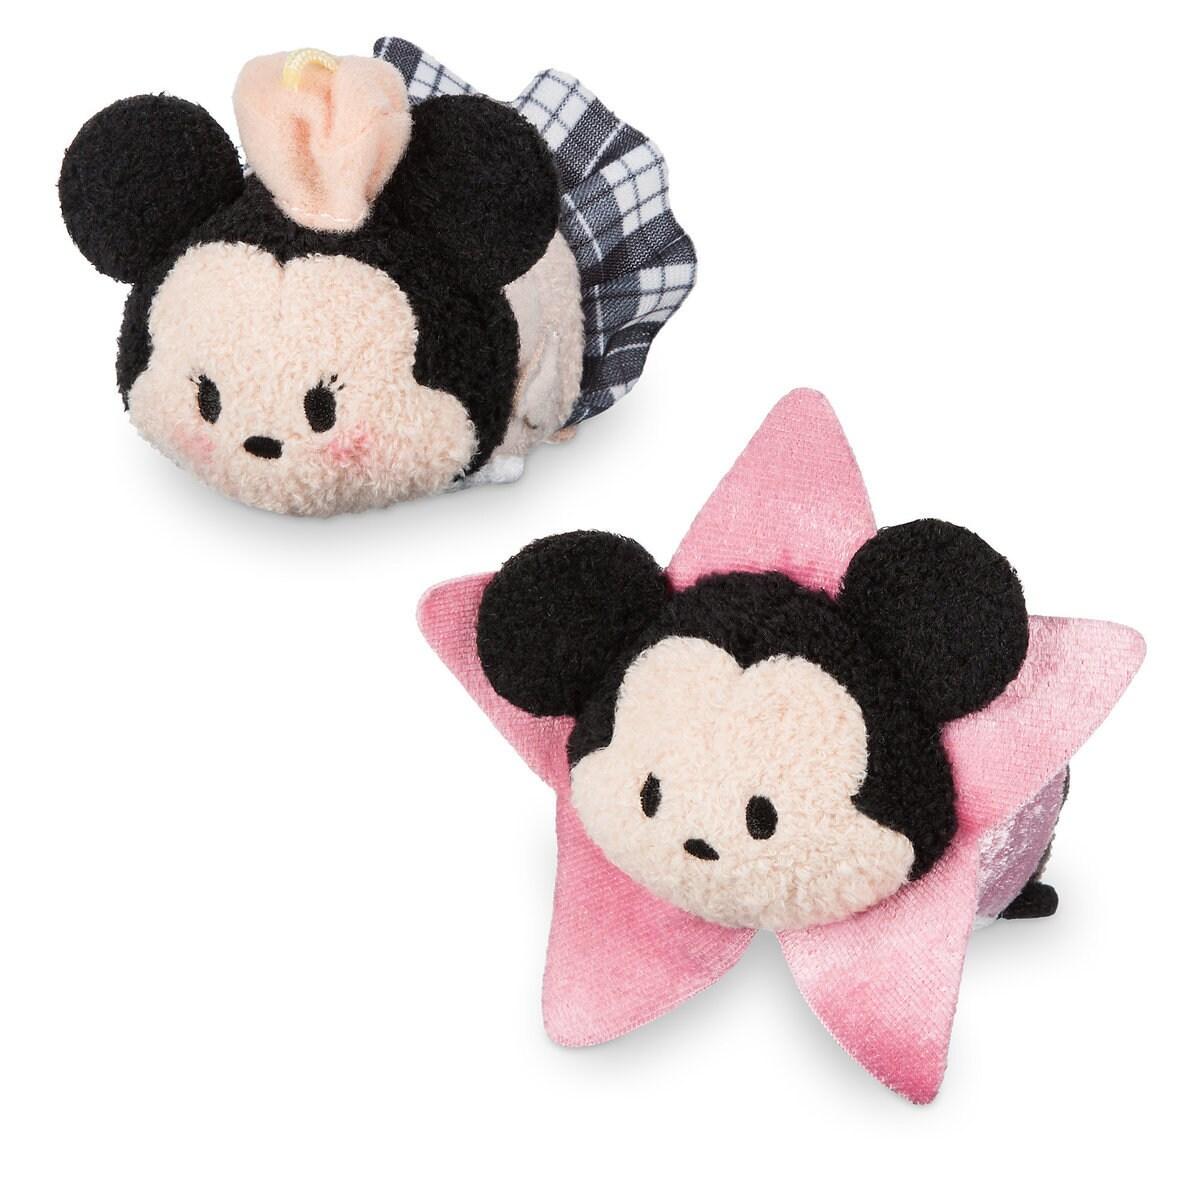 Mickey And Minnie Mouse Tsum Tsum Plush Set Mini 3 12